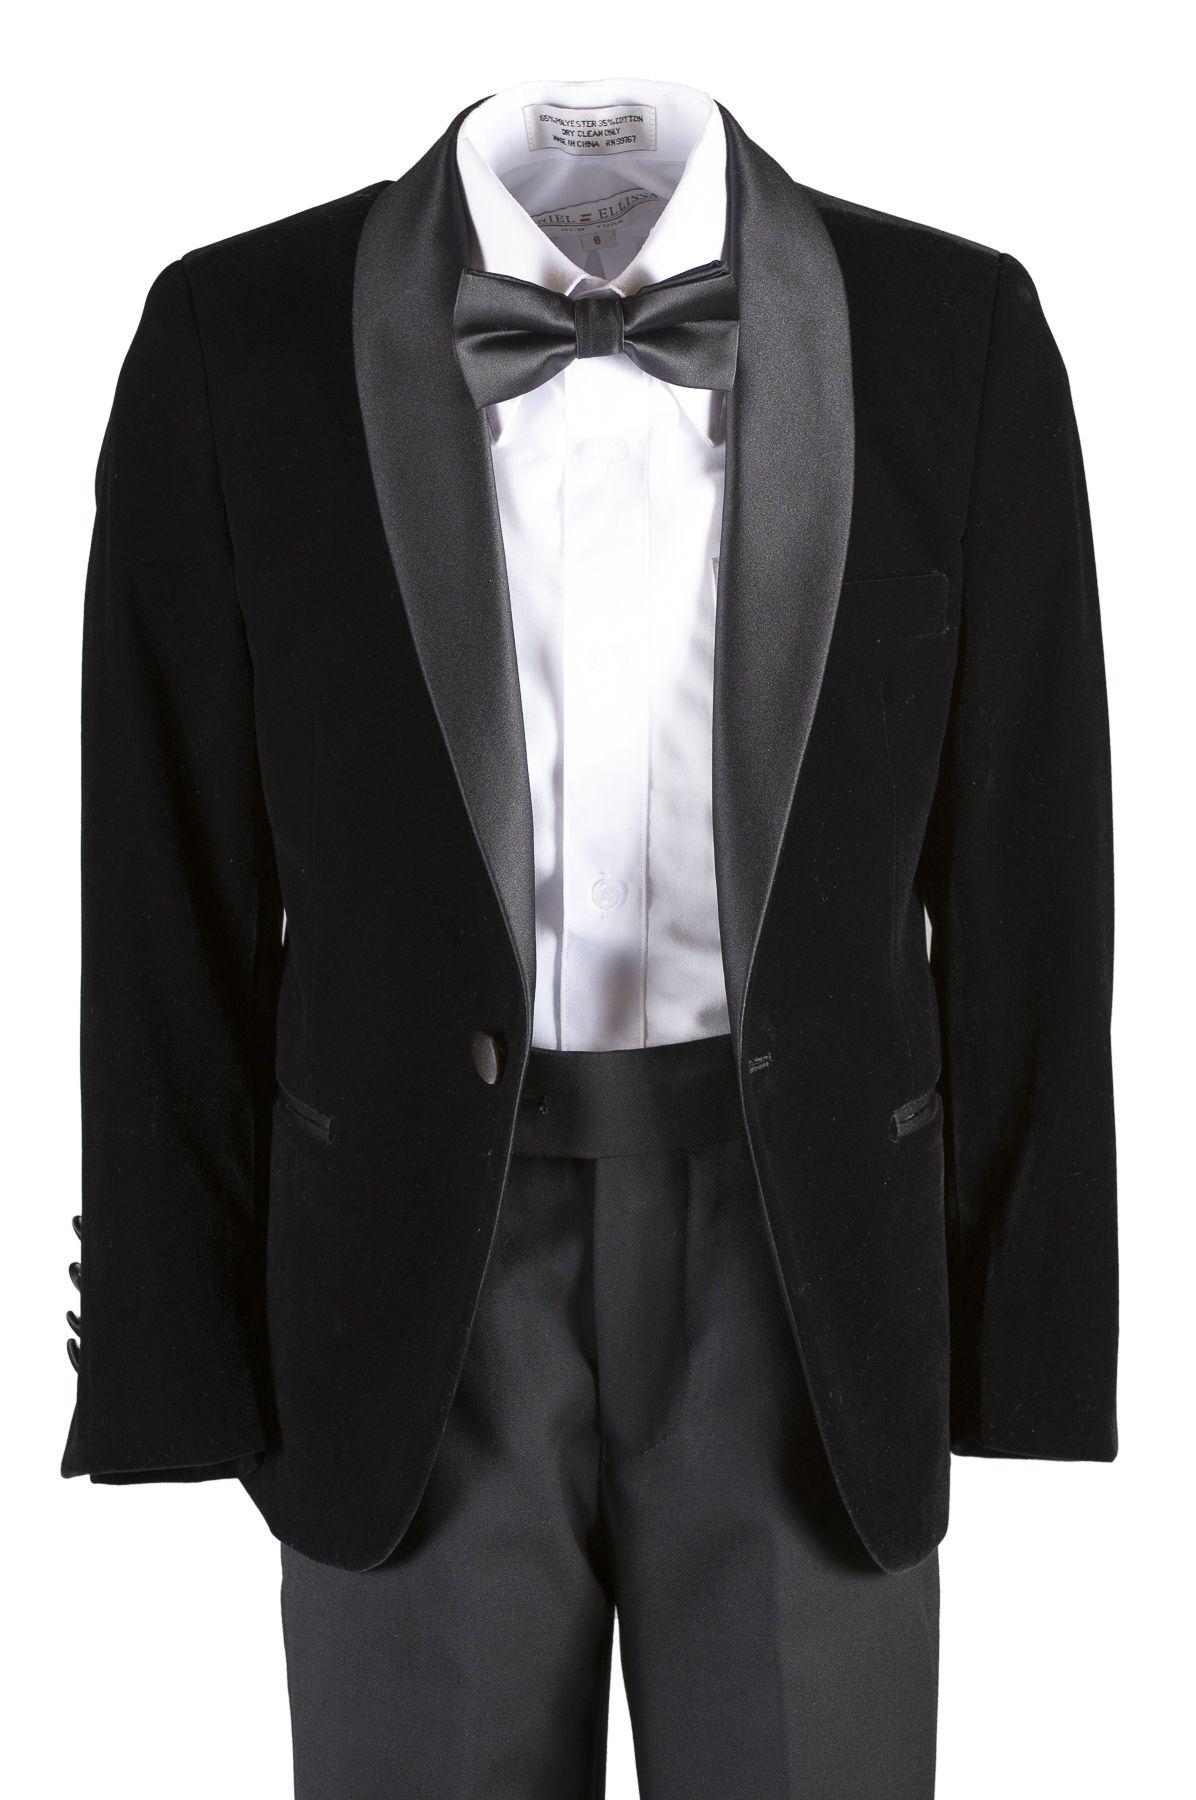 e0ec23e06f9 Boy's formal burgundy velvet dinner suit, available in toddler, boys and  youth sizing.